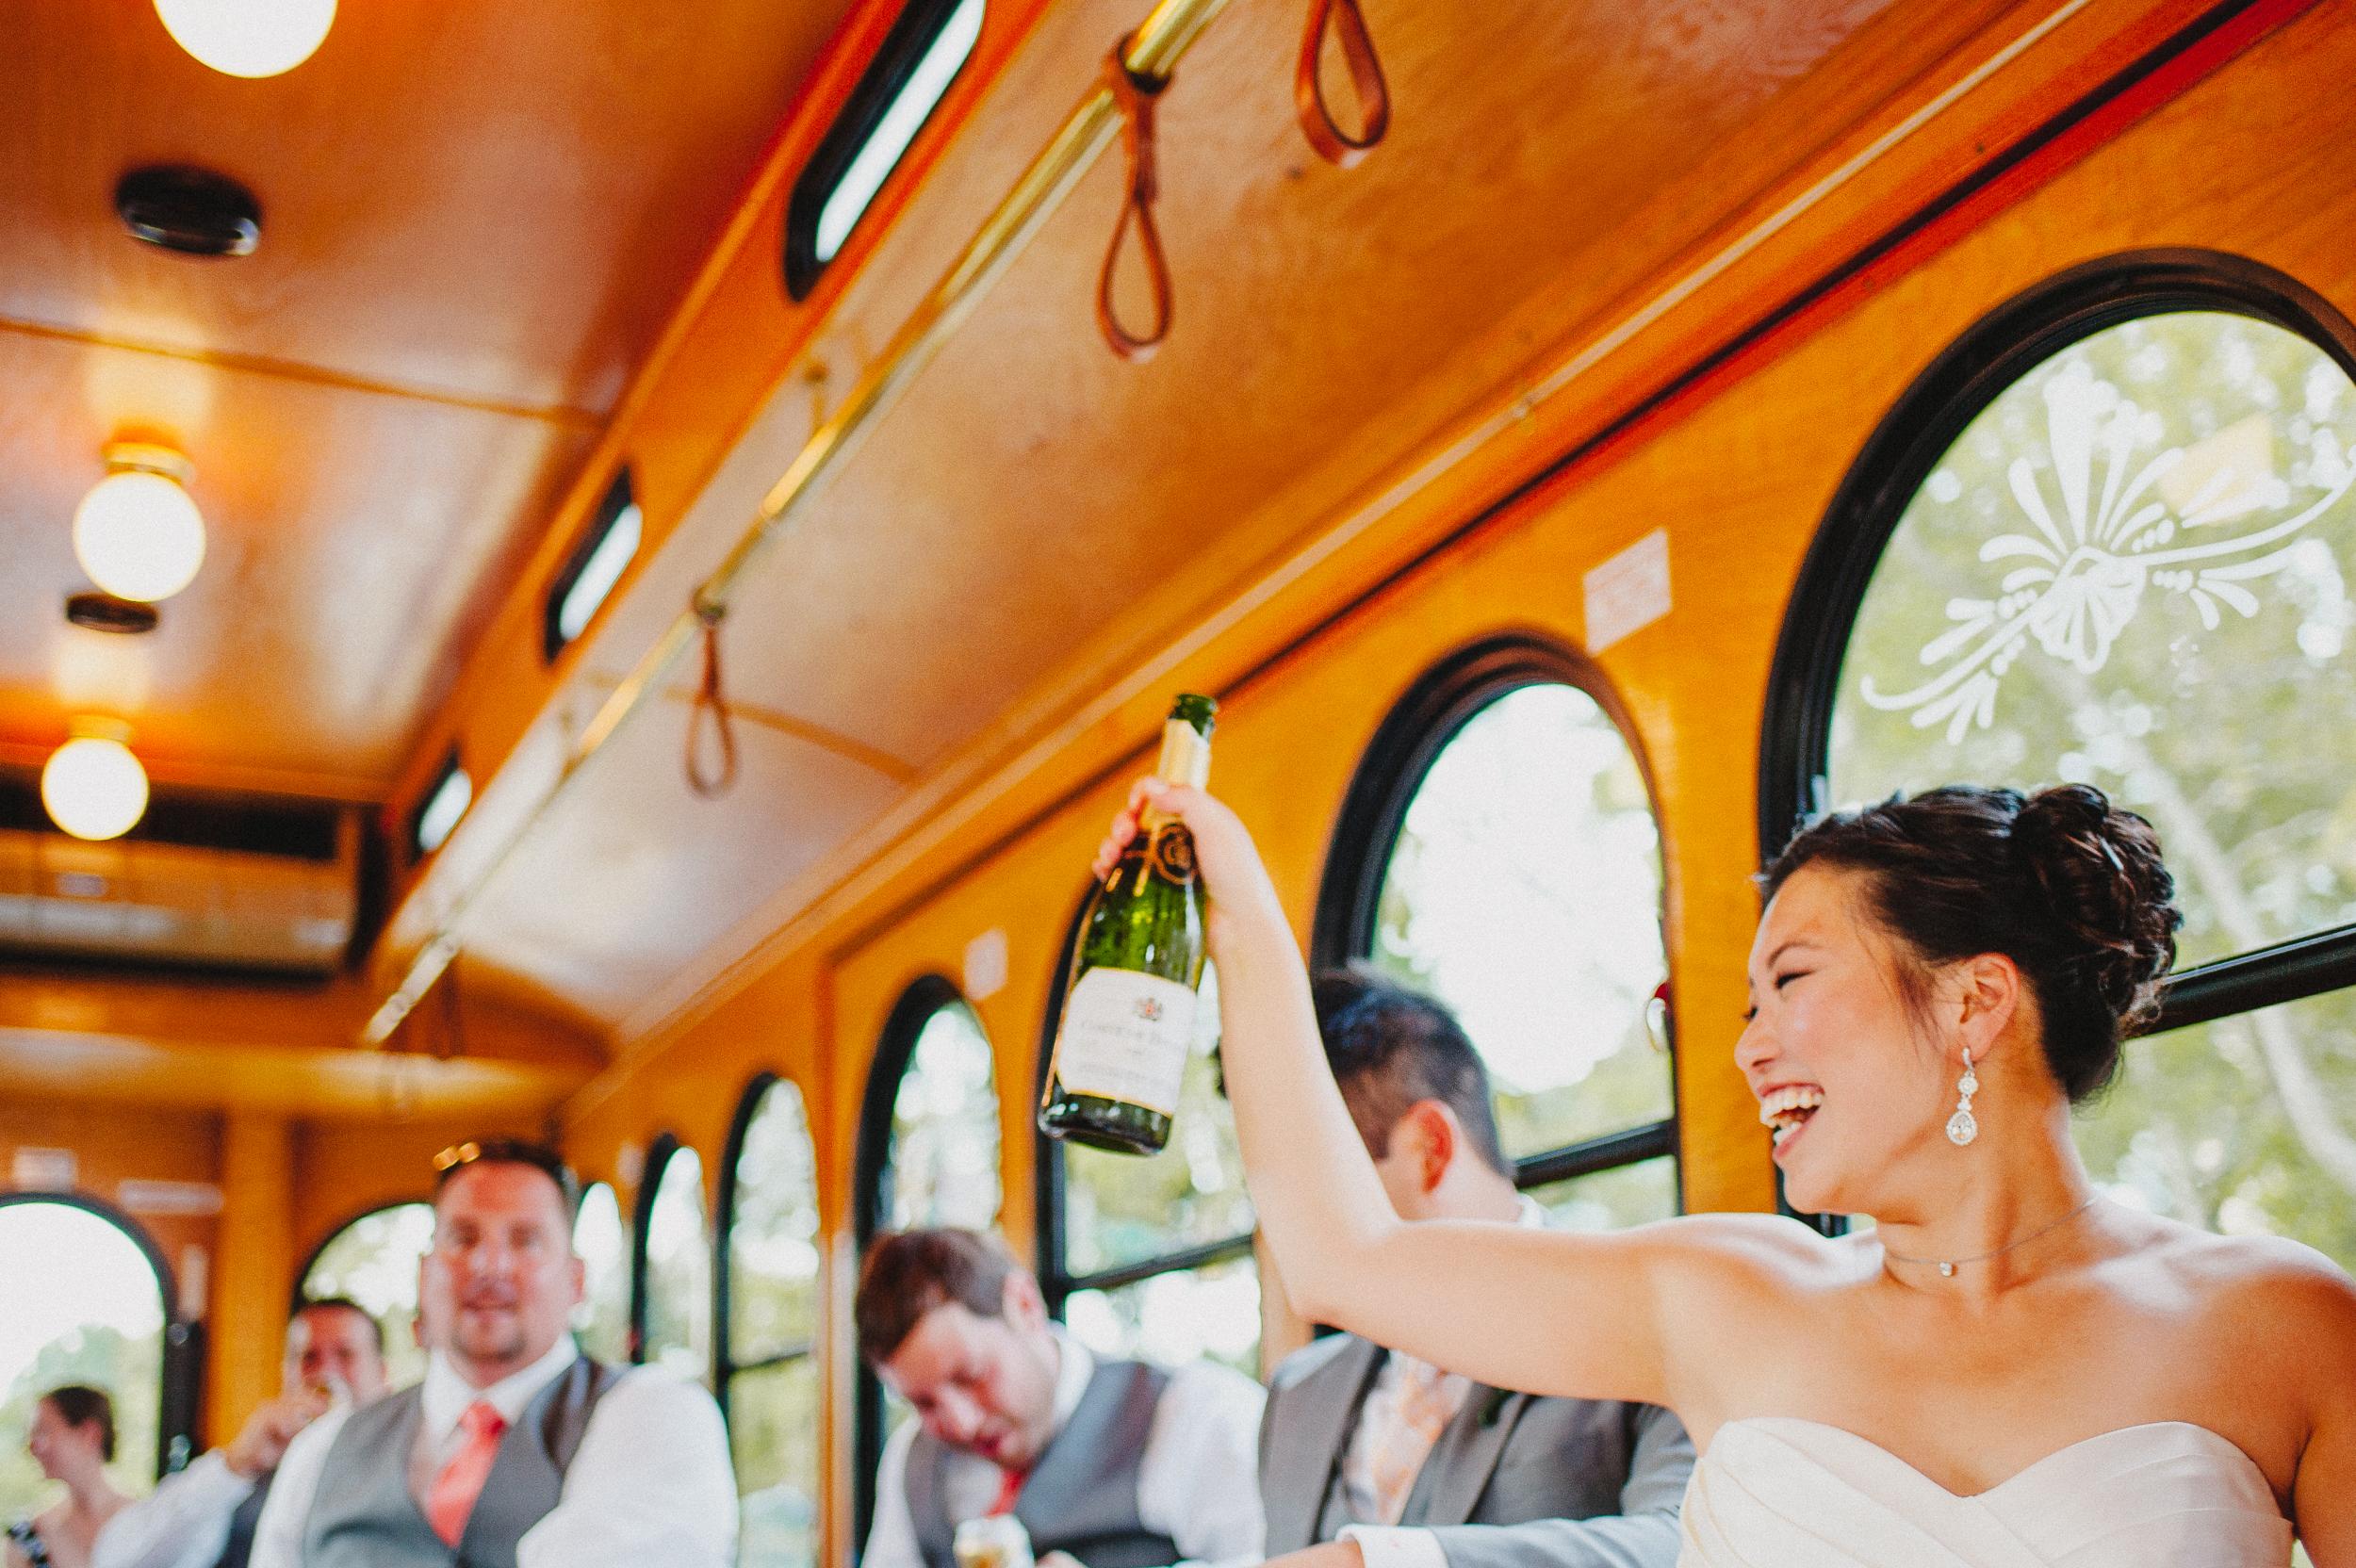 union-trust-philadelphia-wedding-photographer-58.jpg